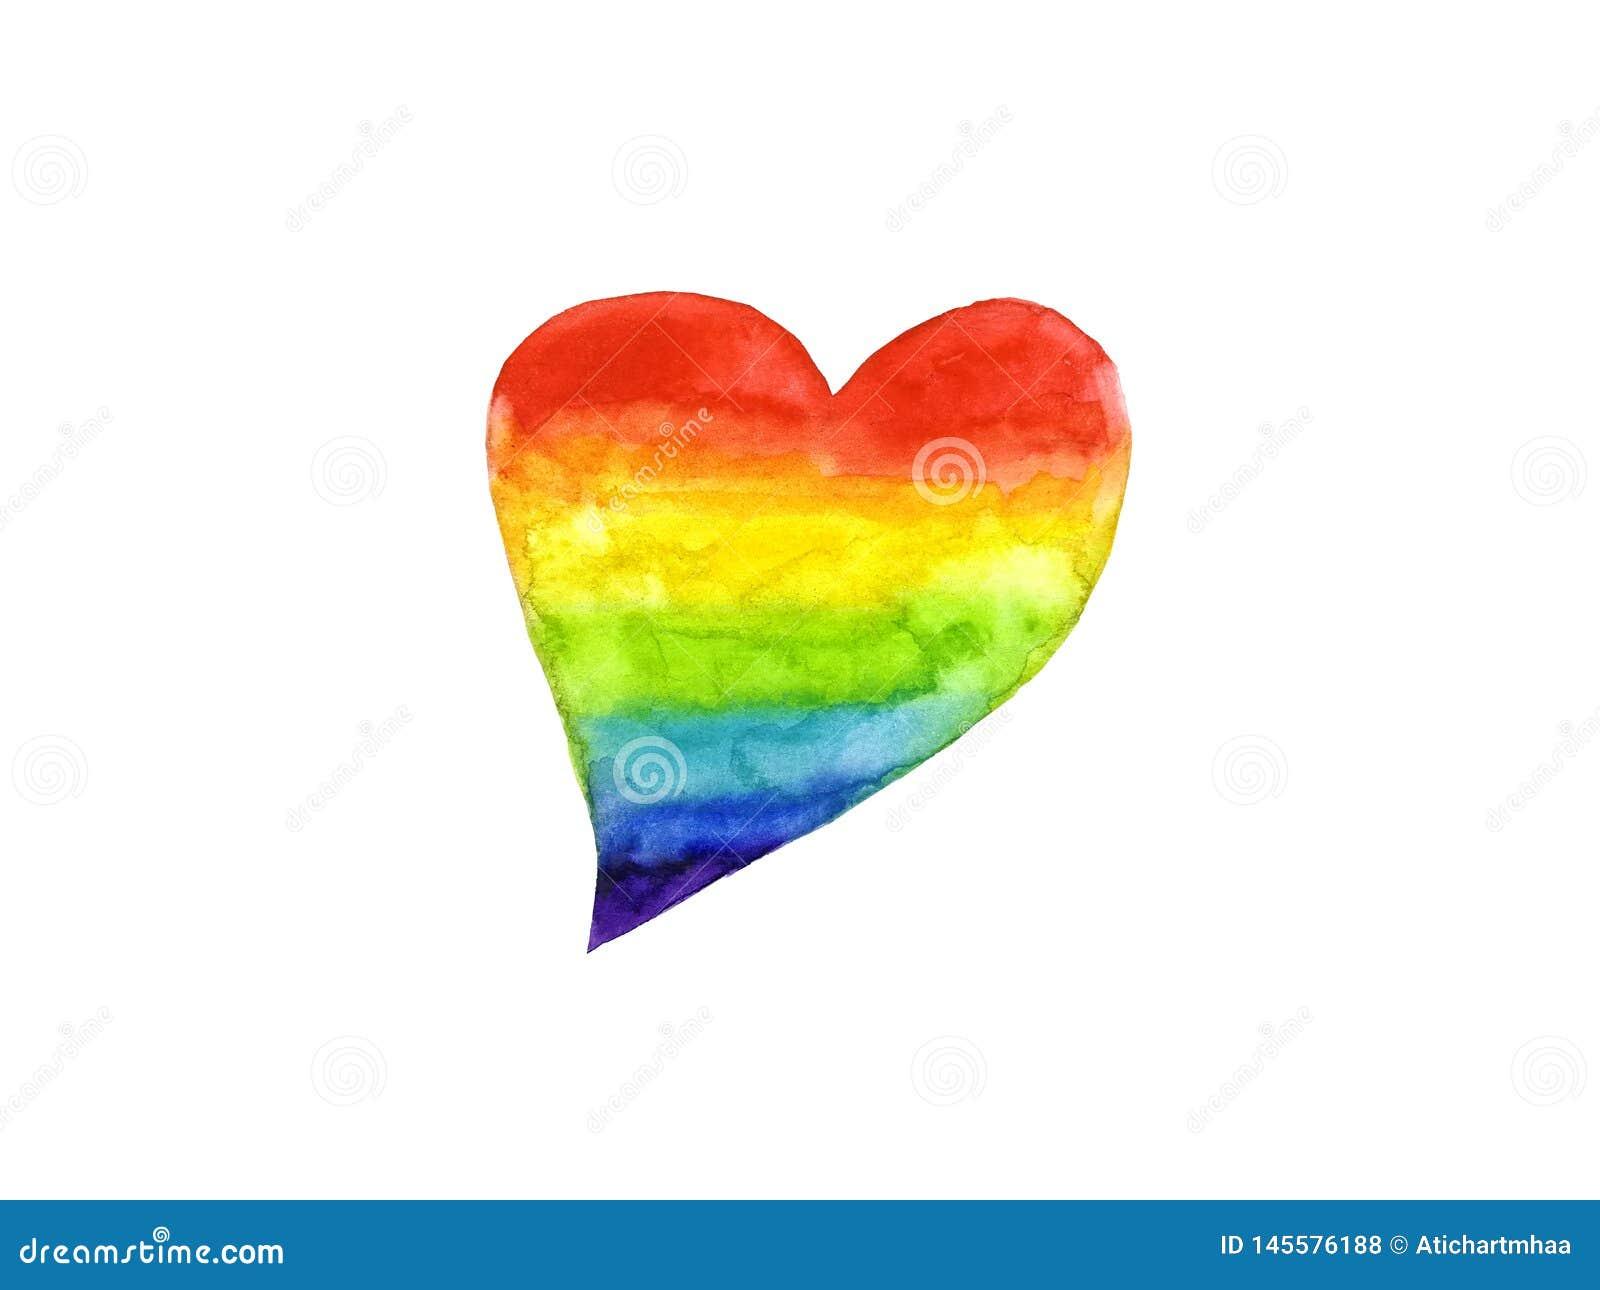 Watercolor rainbow heart symbol LGBT or Lesbian, Gay, Bisexual,Transgender